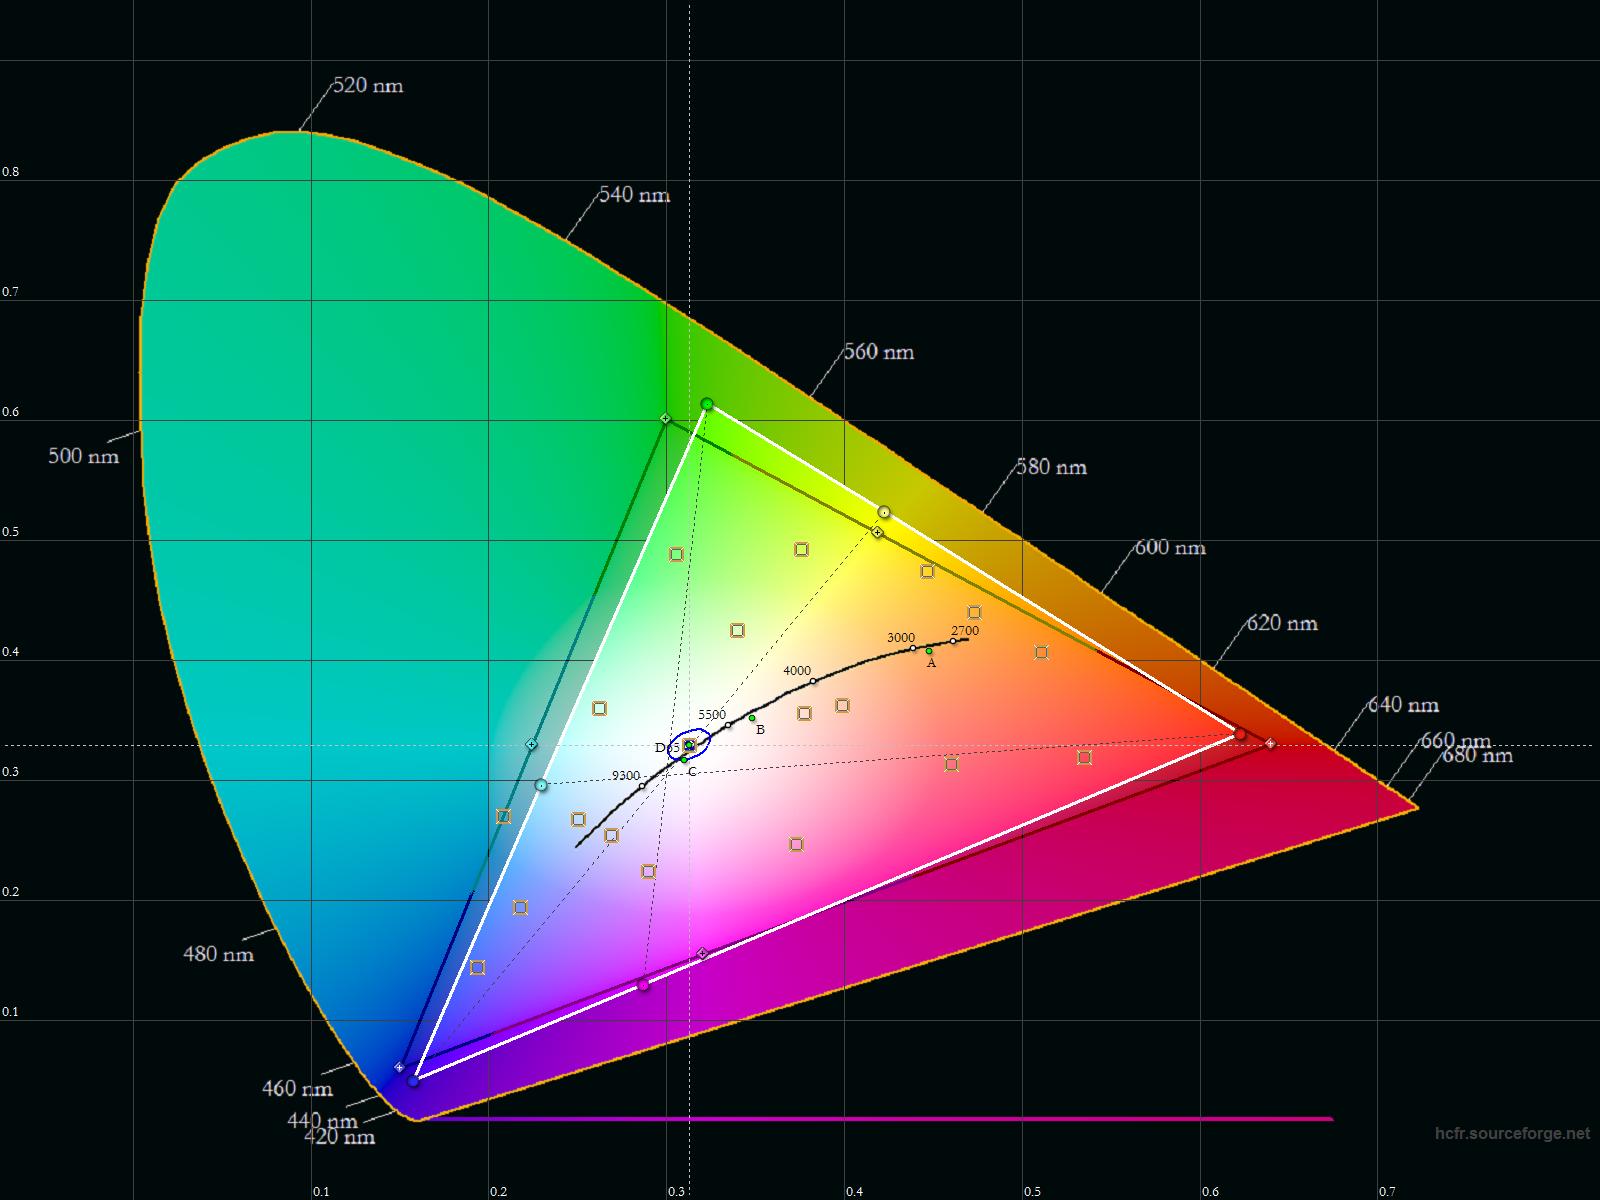 Meizu M3 Note – цветовой охват. Серый треугольник – охват sRGB, белый треугольник – охват M3 Note